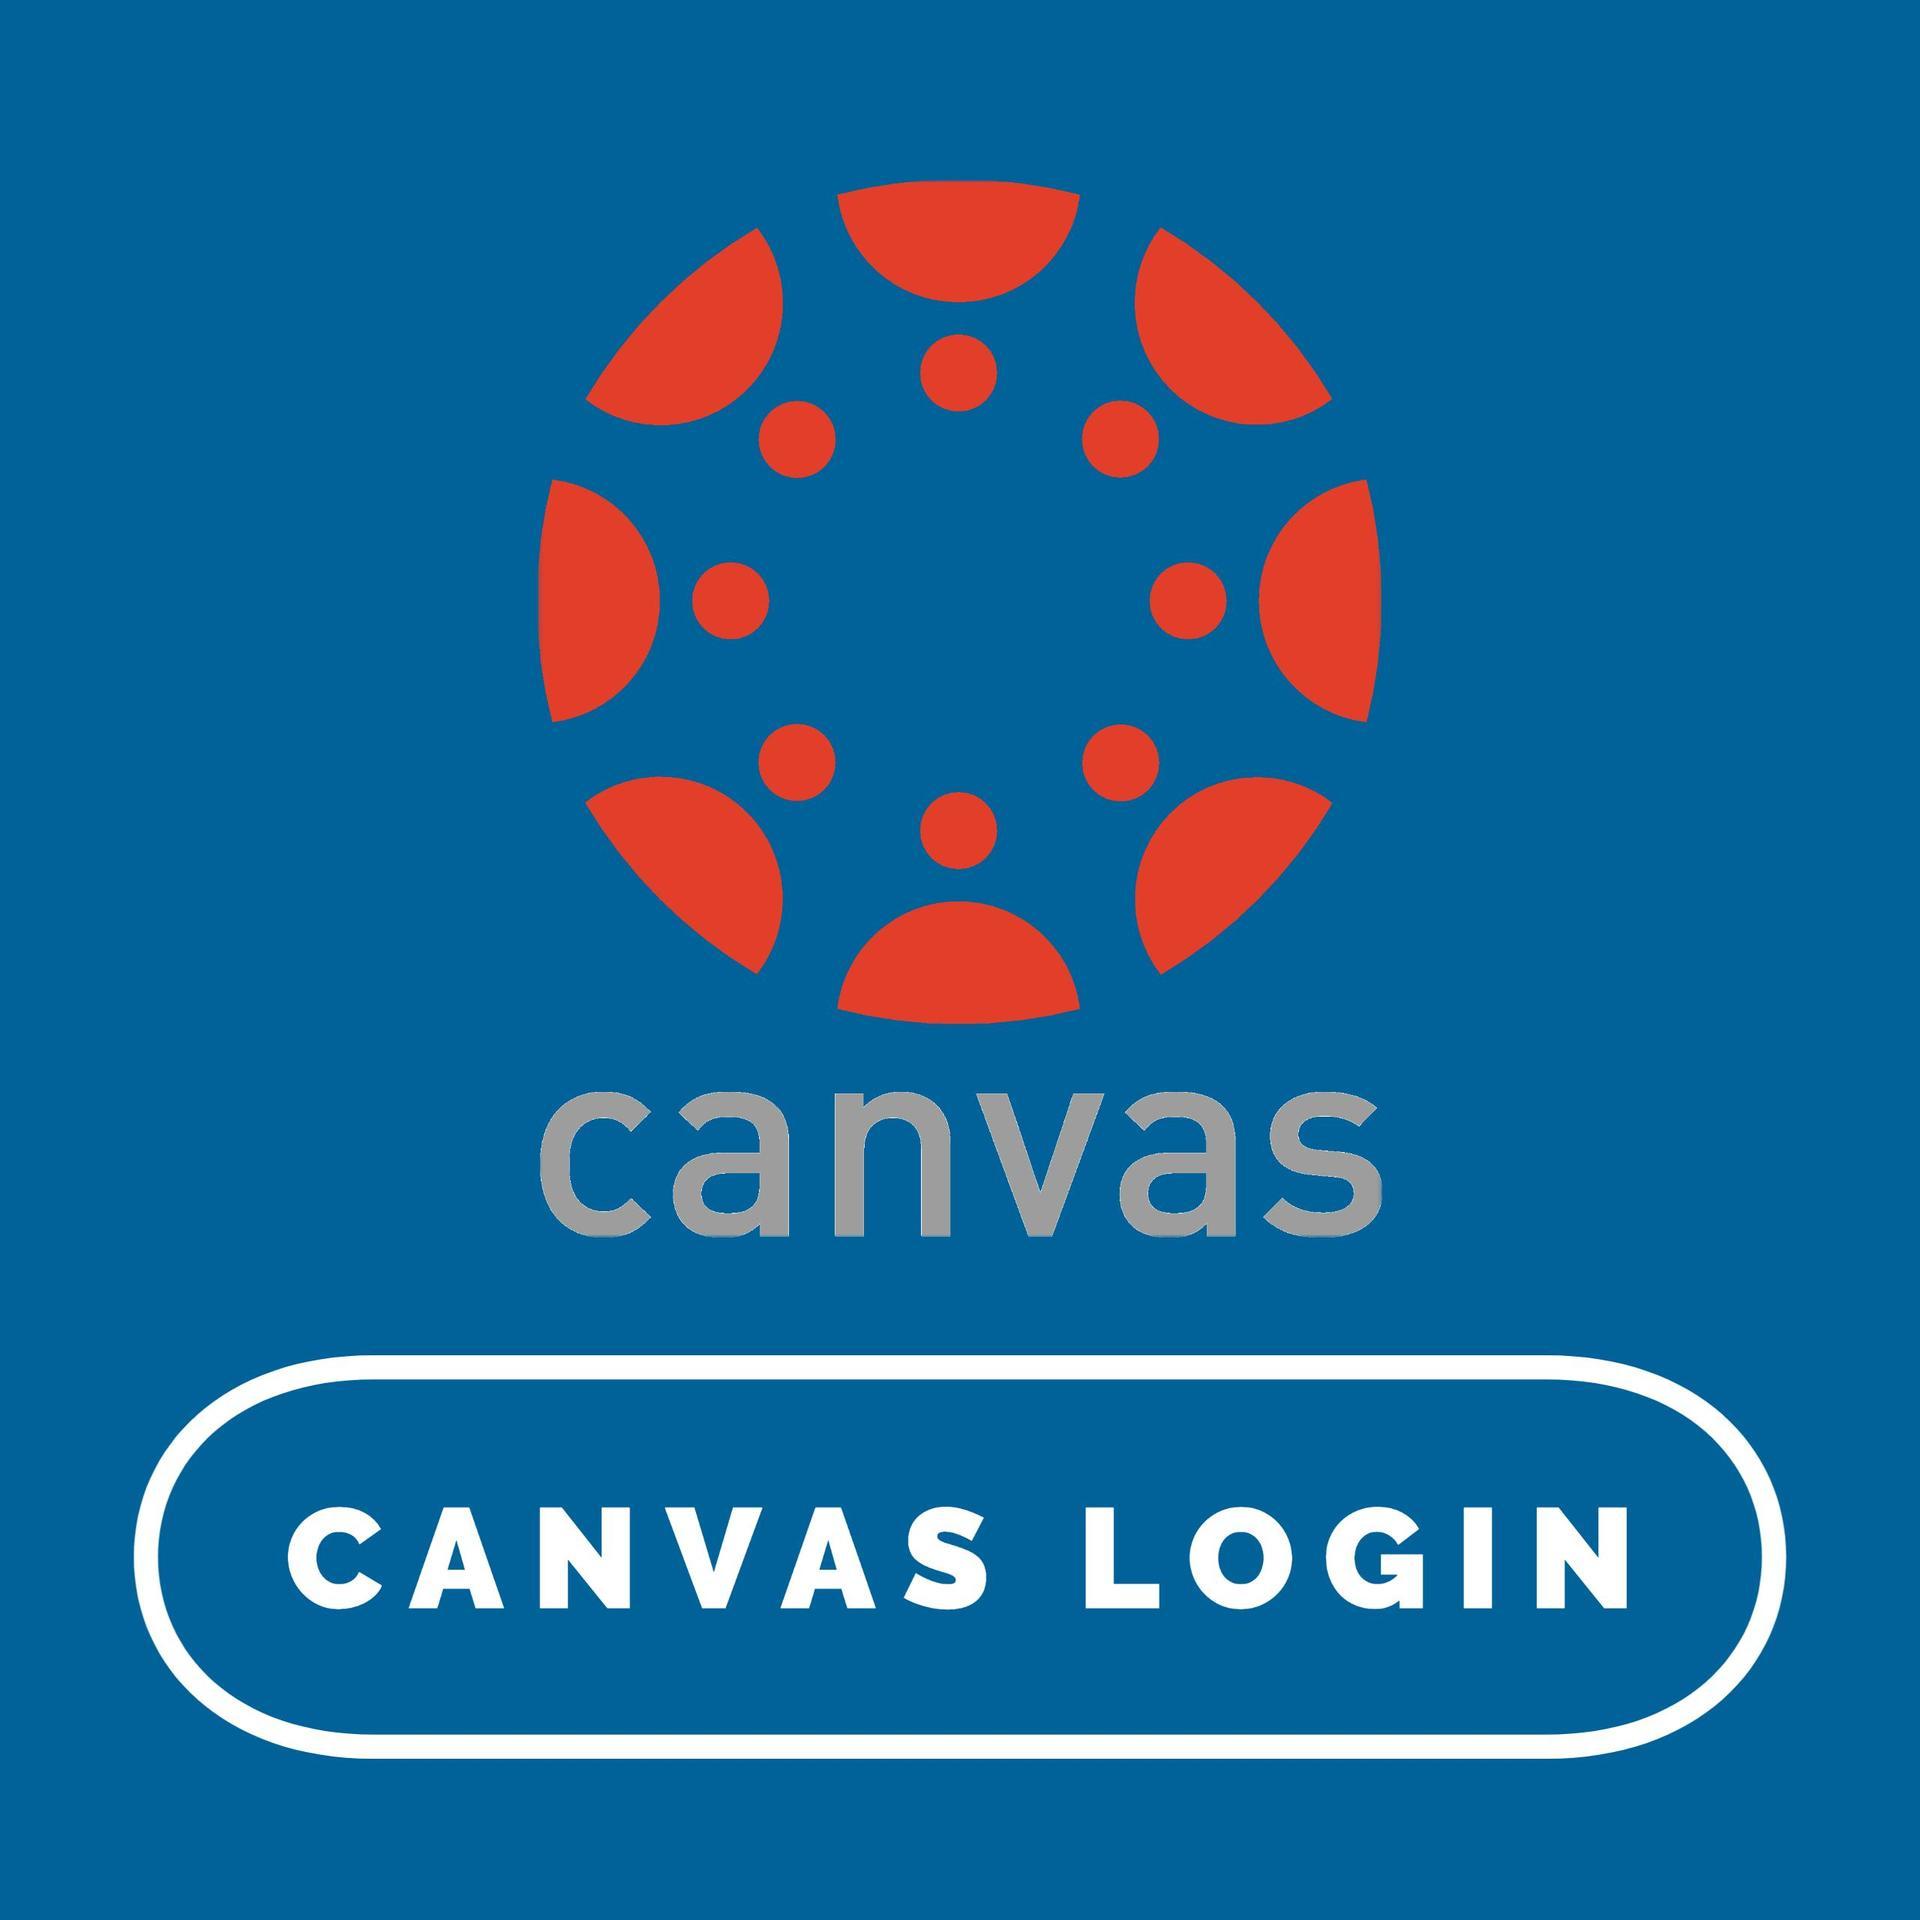 canvas login button